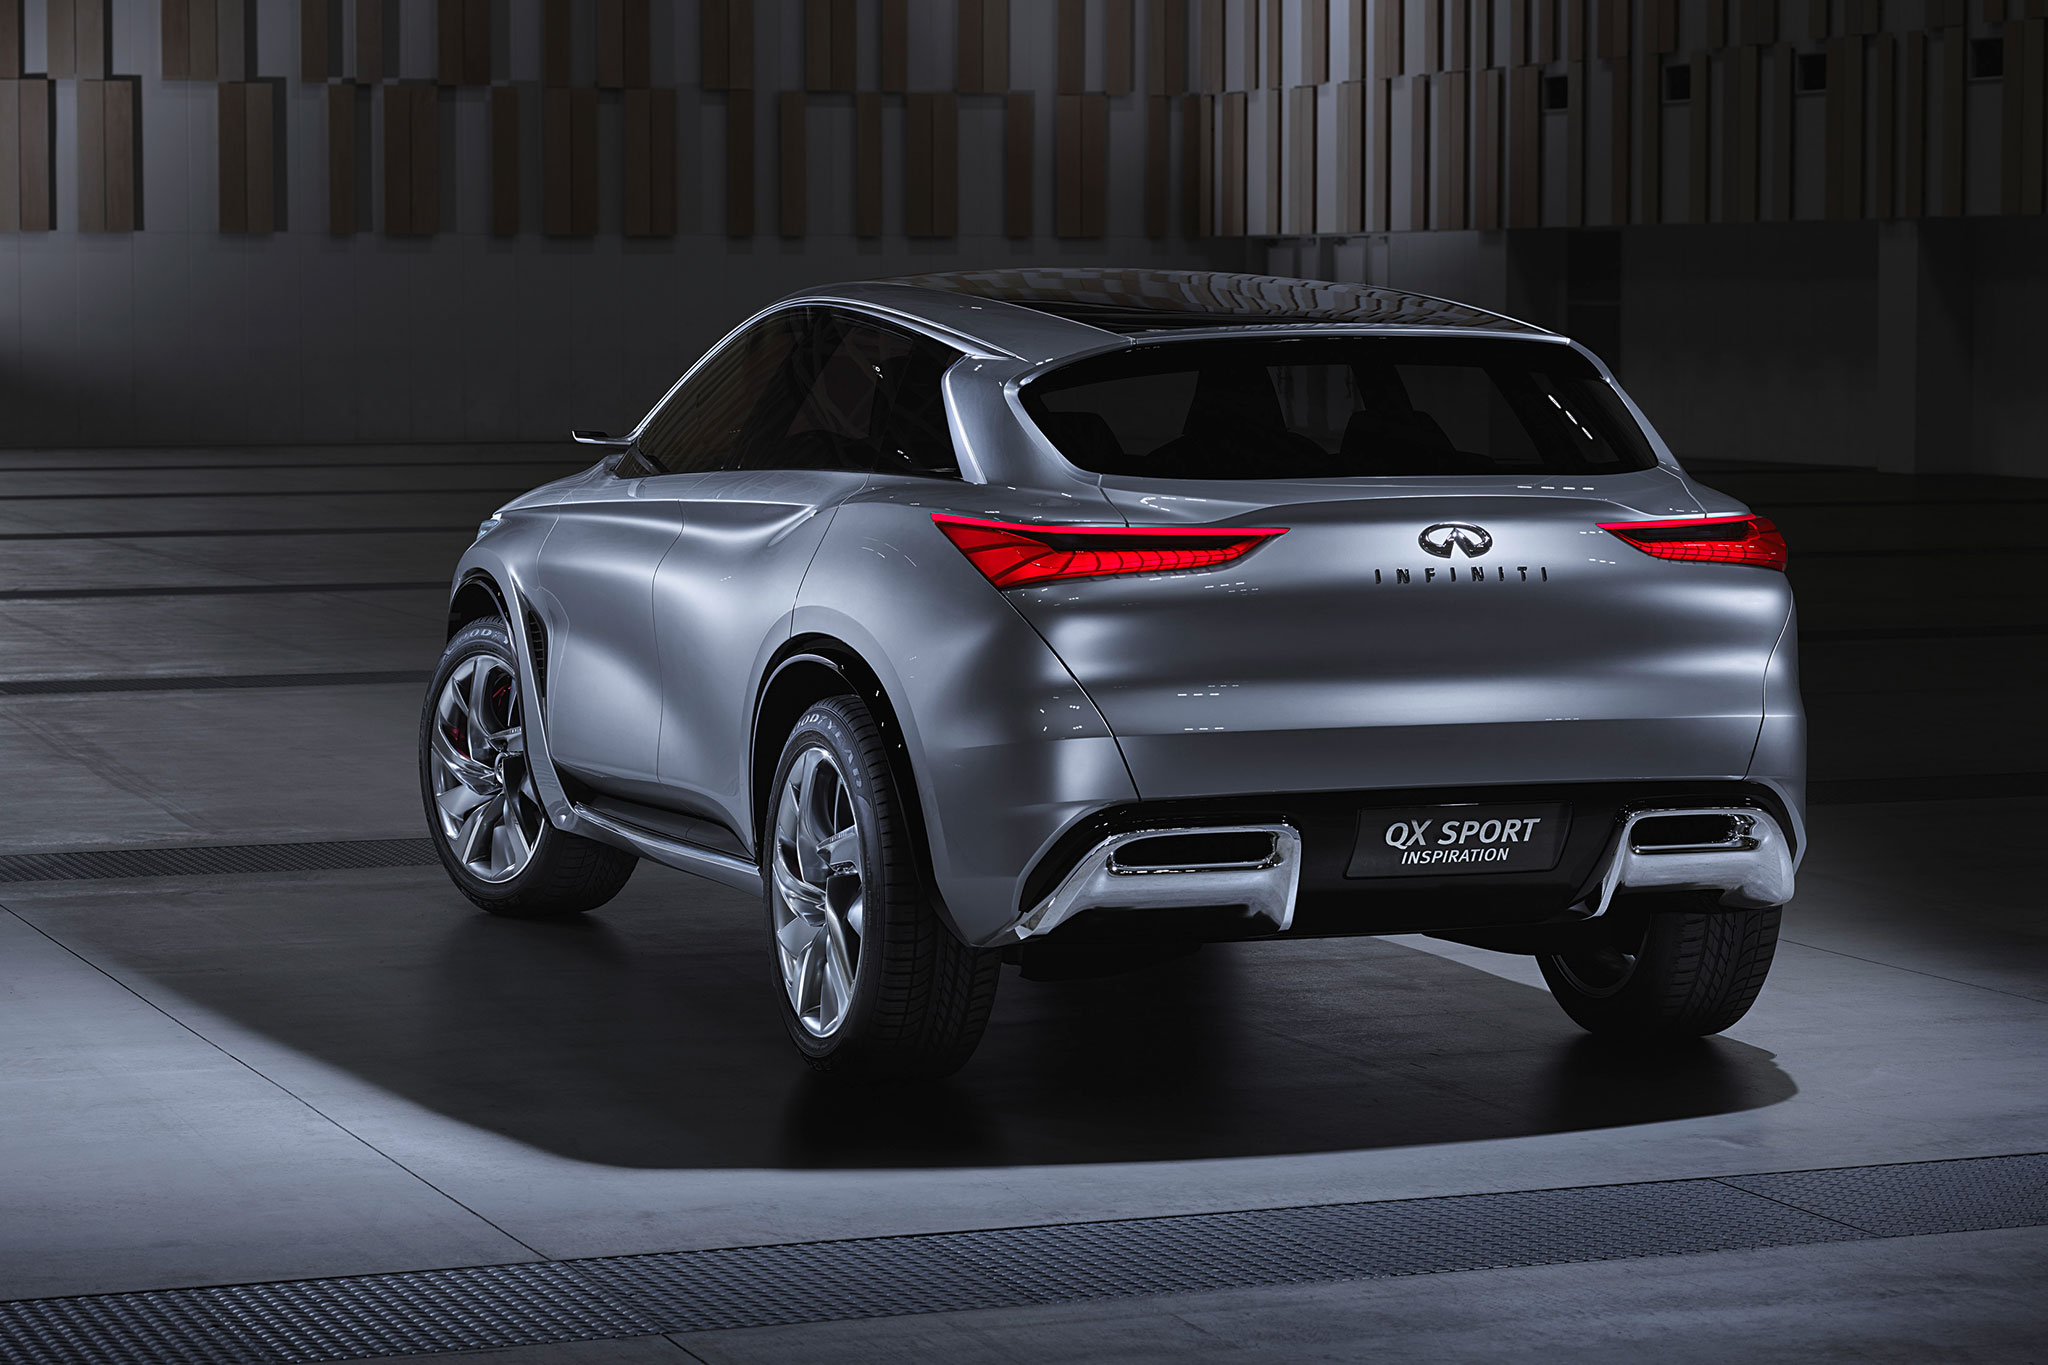 infiniti qx sport inspiration concept shows brands future suv designs automobile magazine